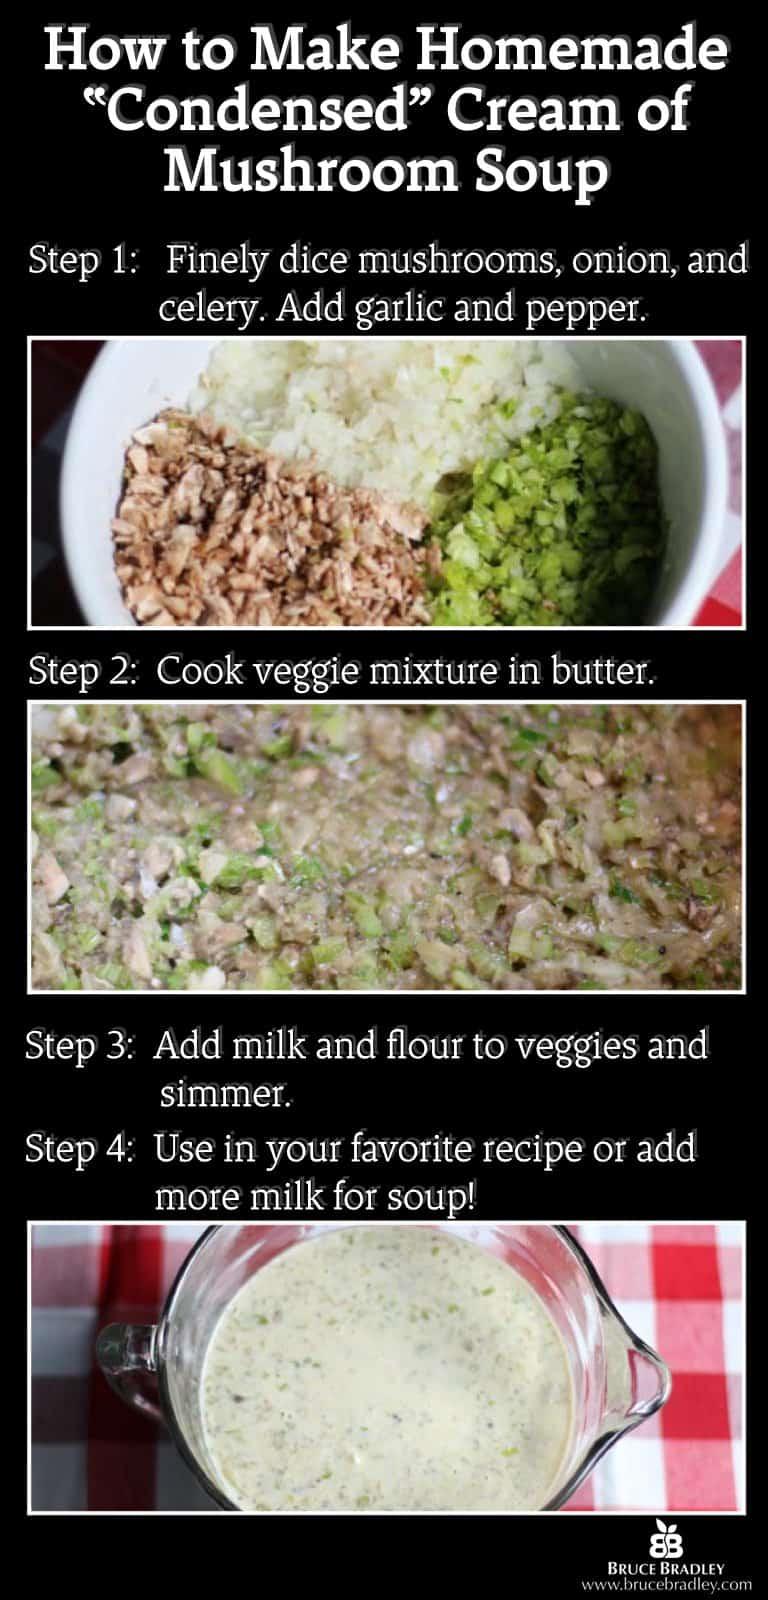 How to make Homemade Cream of Mushroom Condensed Soup